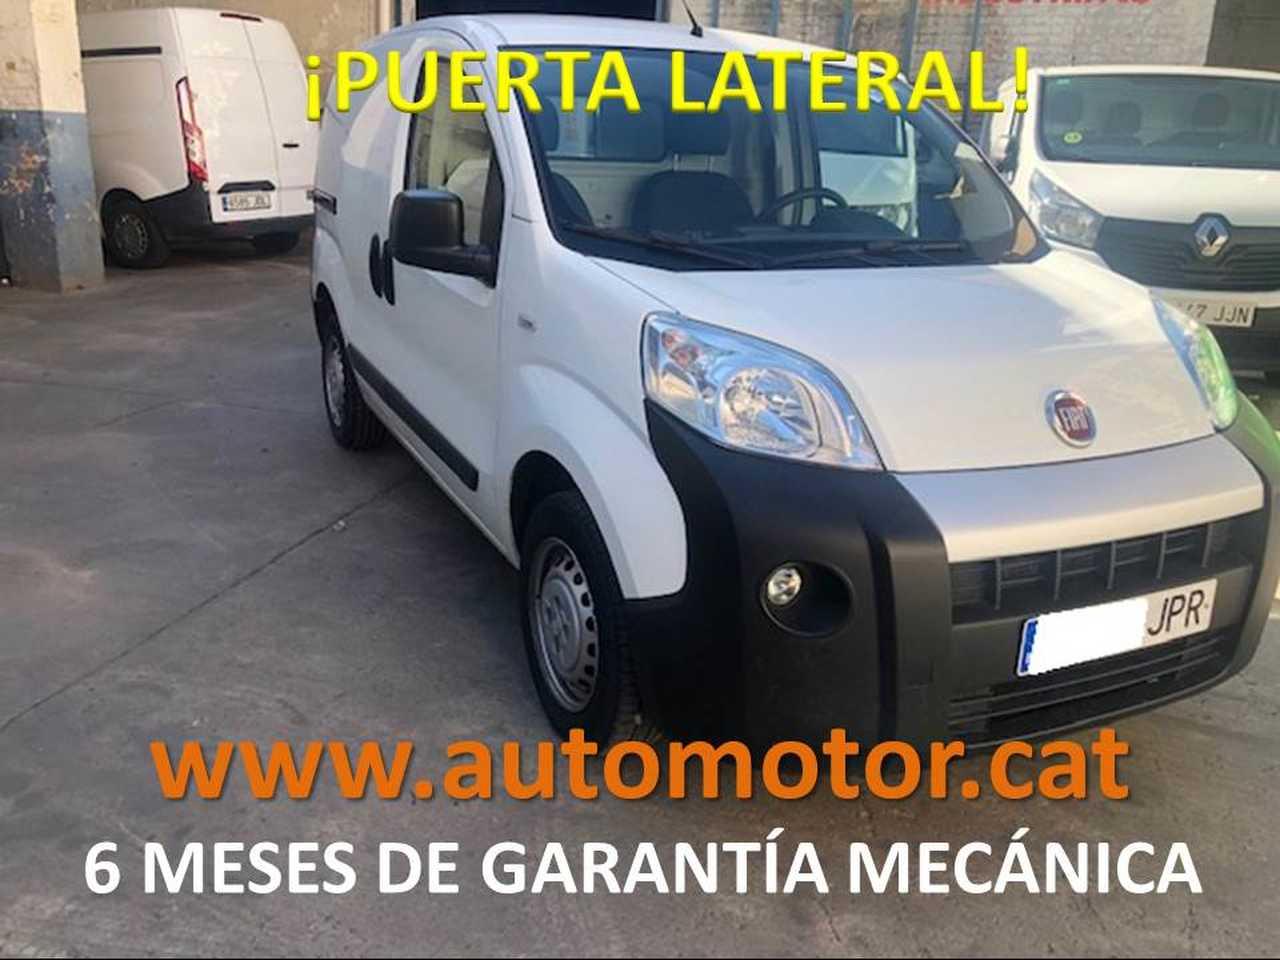 Fiat Fiorino Cargo Cargo 1.3Mjt Clase 2 75 E5  - GARANTIA MECANICA  - Foto 1